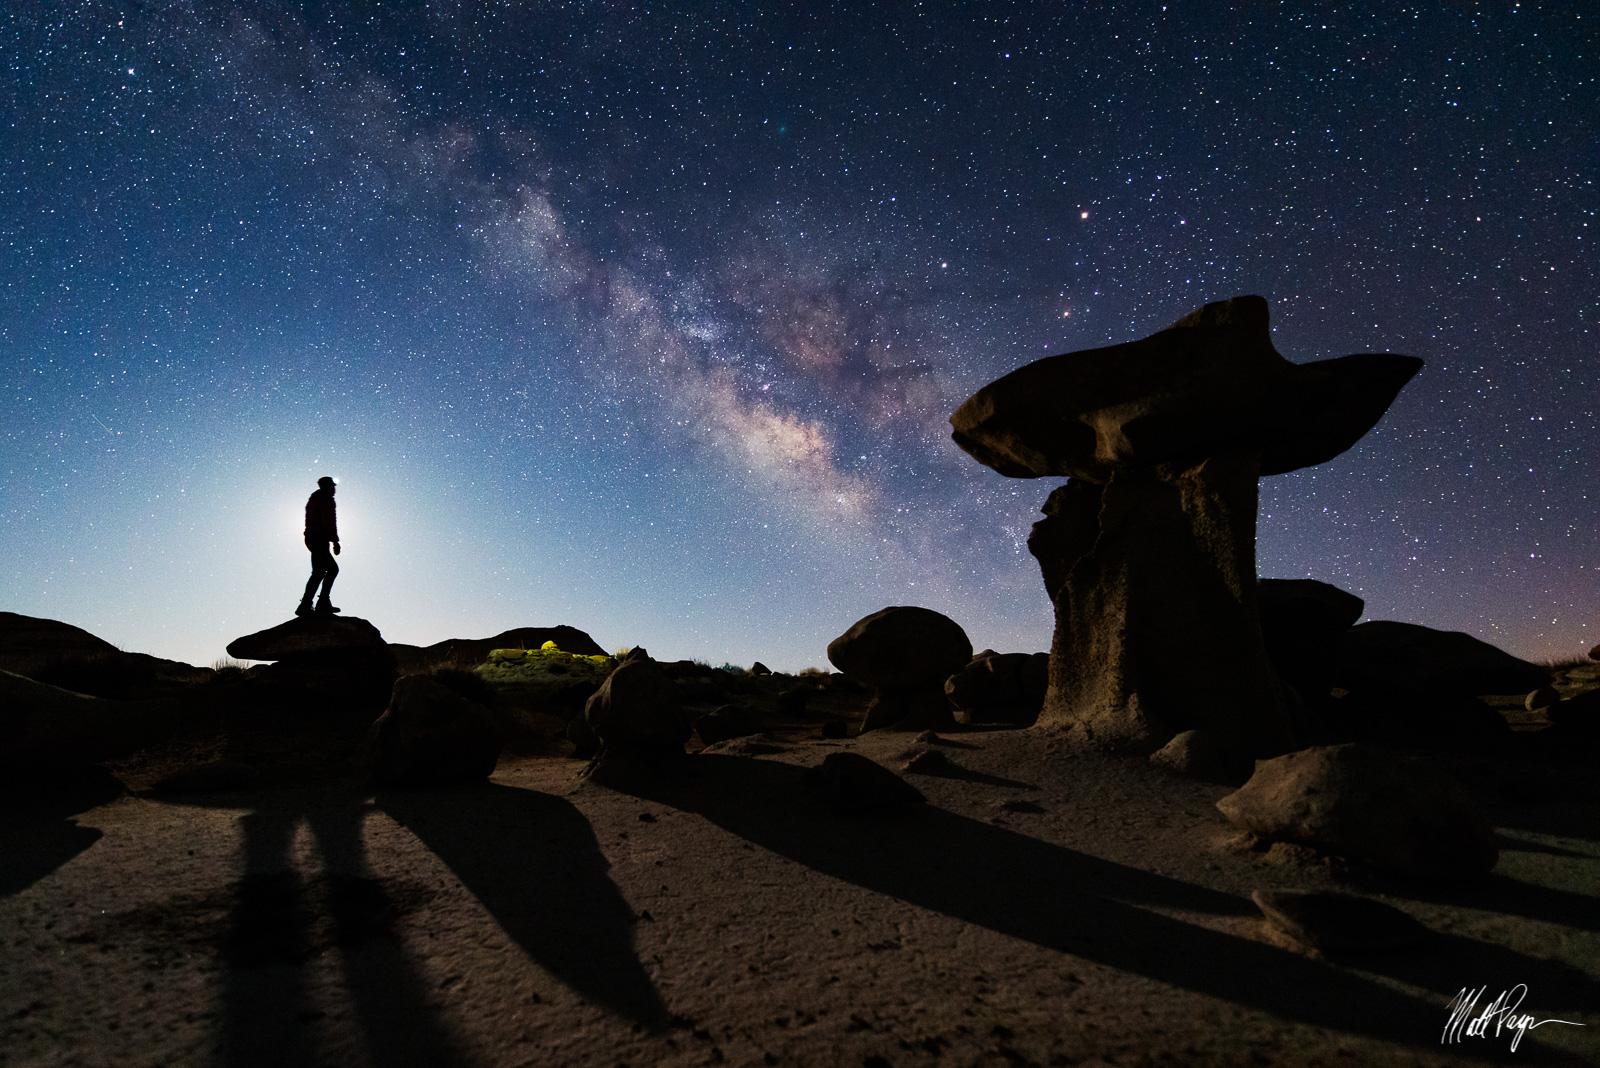 April, Bisti Badlands, De-Na-Zin Wilderness, Hoodoo, Milky Way, New Mexico, Night, Nightscape, Stars, The Pedestal, Wilderness, desert, photo